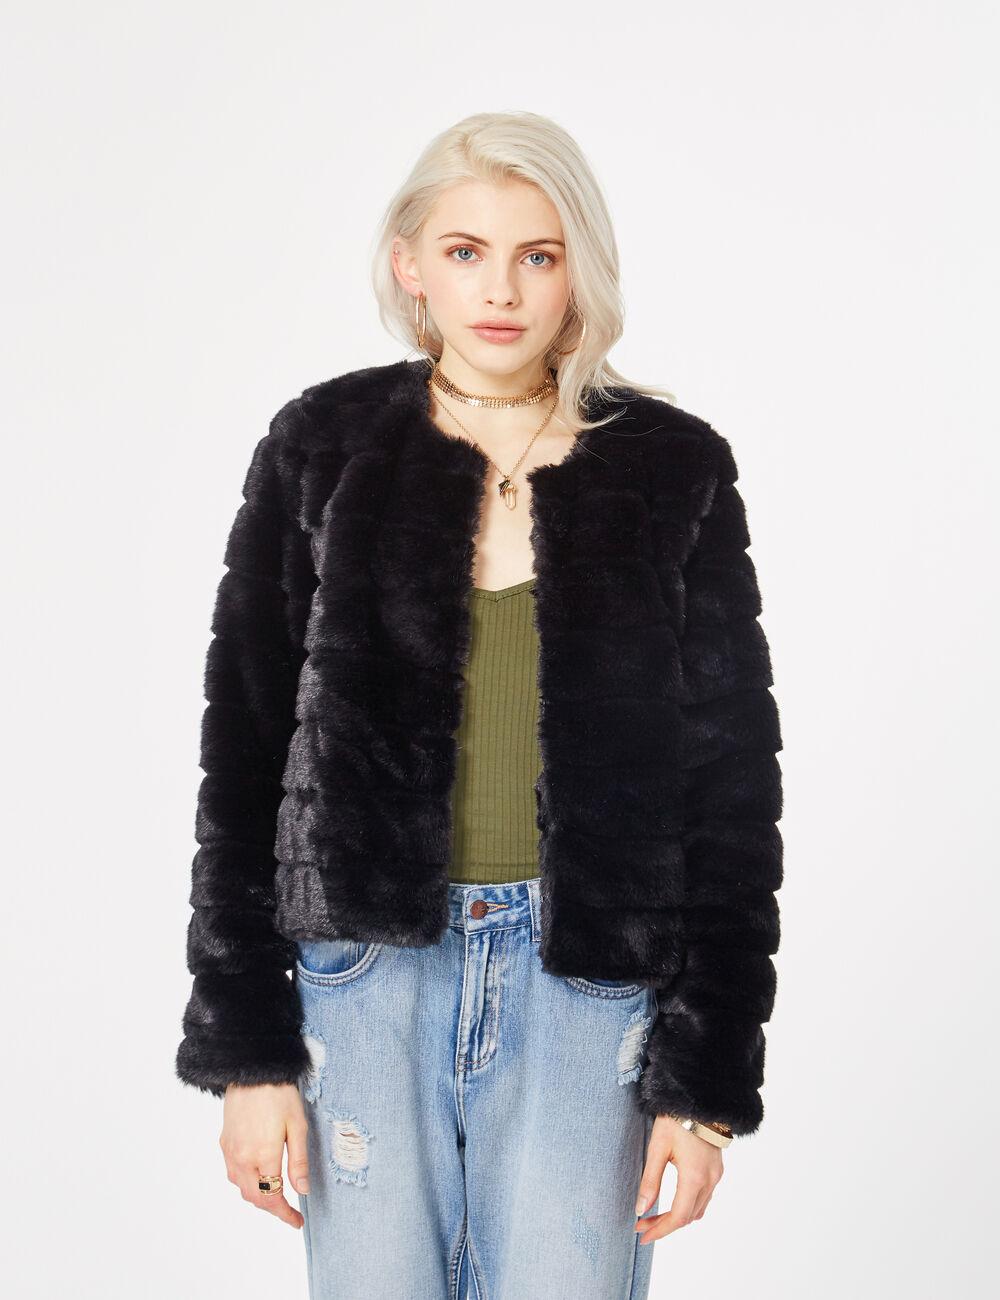 cd6fed67292b0 Veste fausse fourrure noire jennyfer – Mode européenne 2018-2019